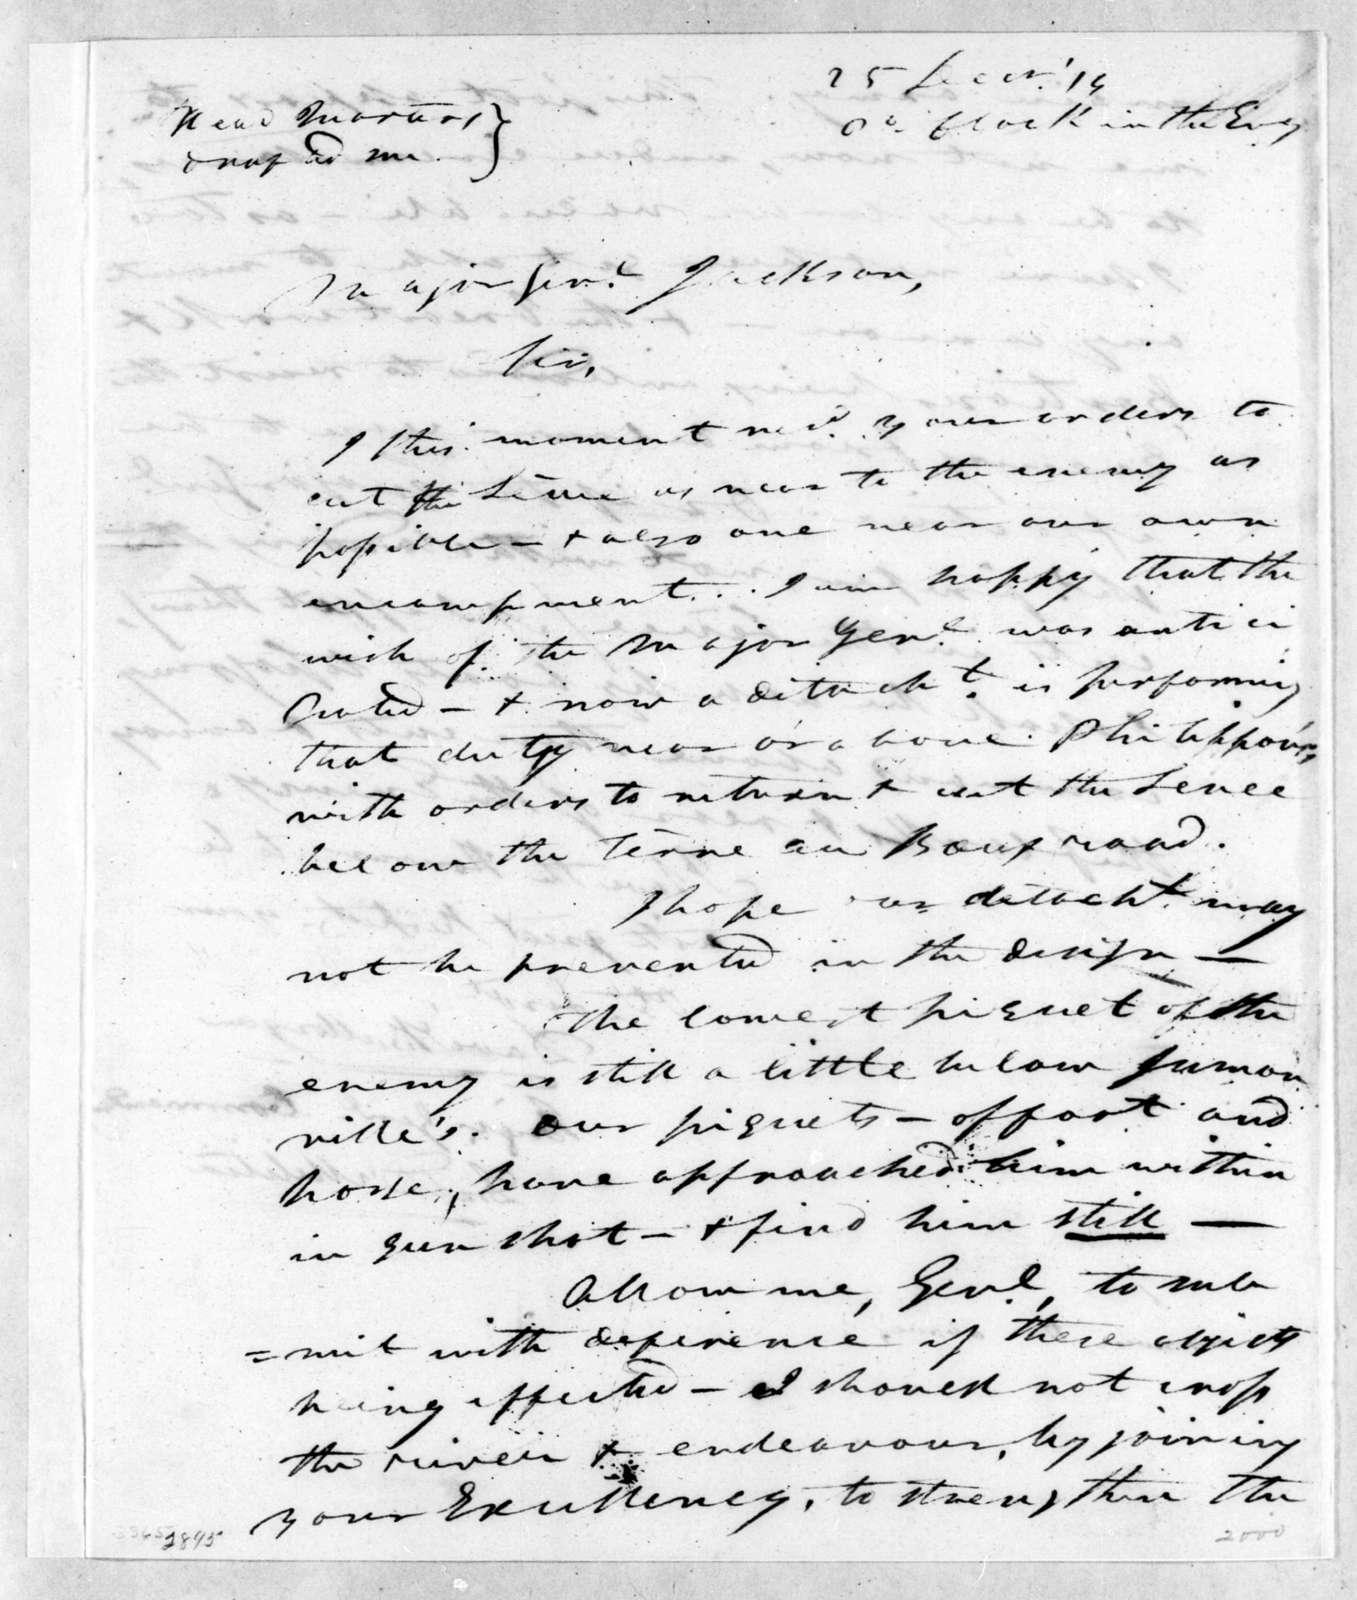 David Bannister Morgan to Andrew Jackson, December 25, 1814